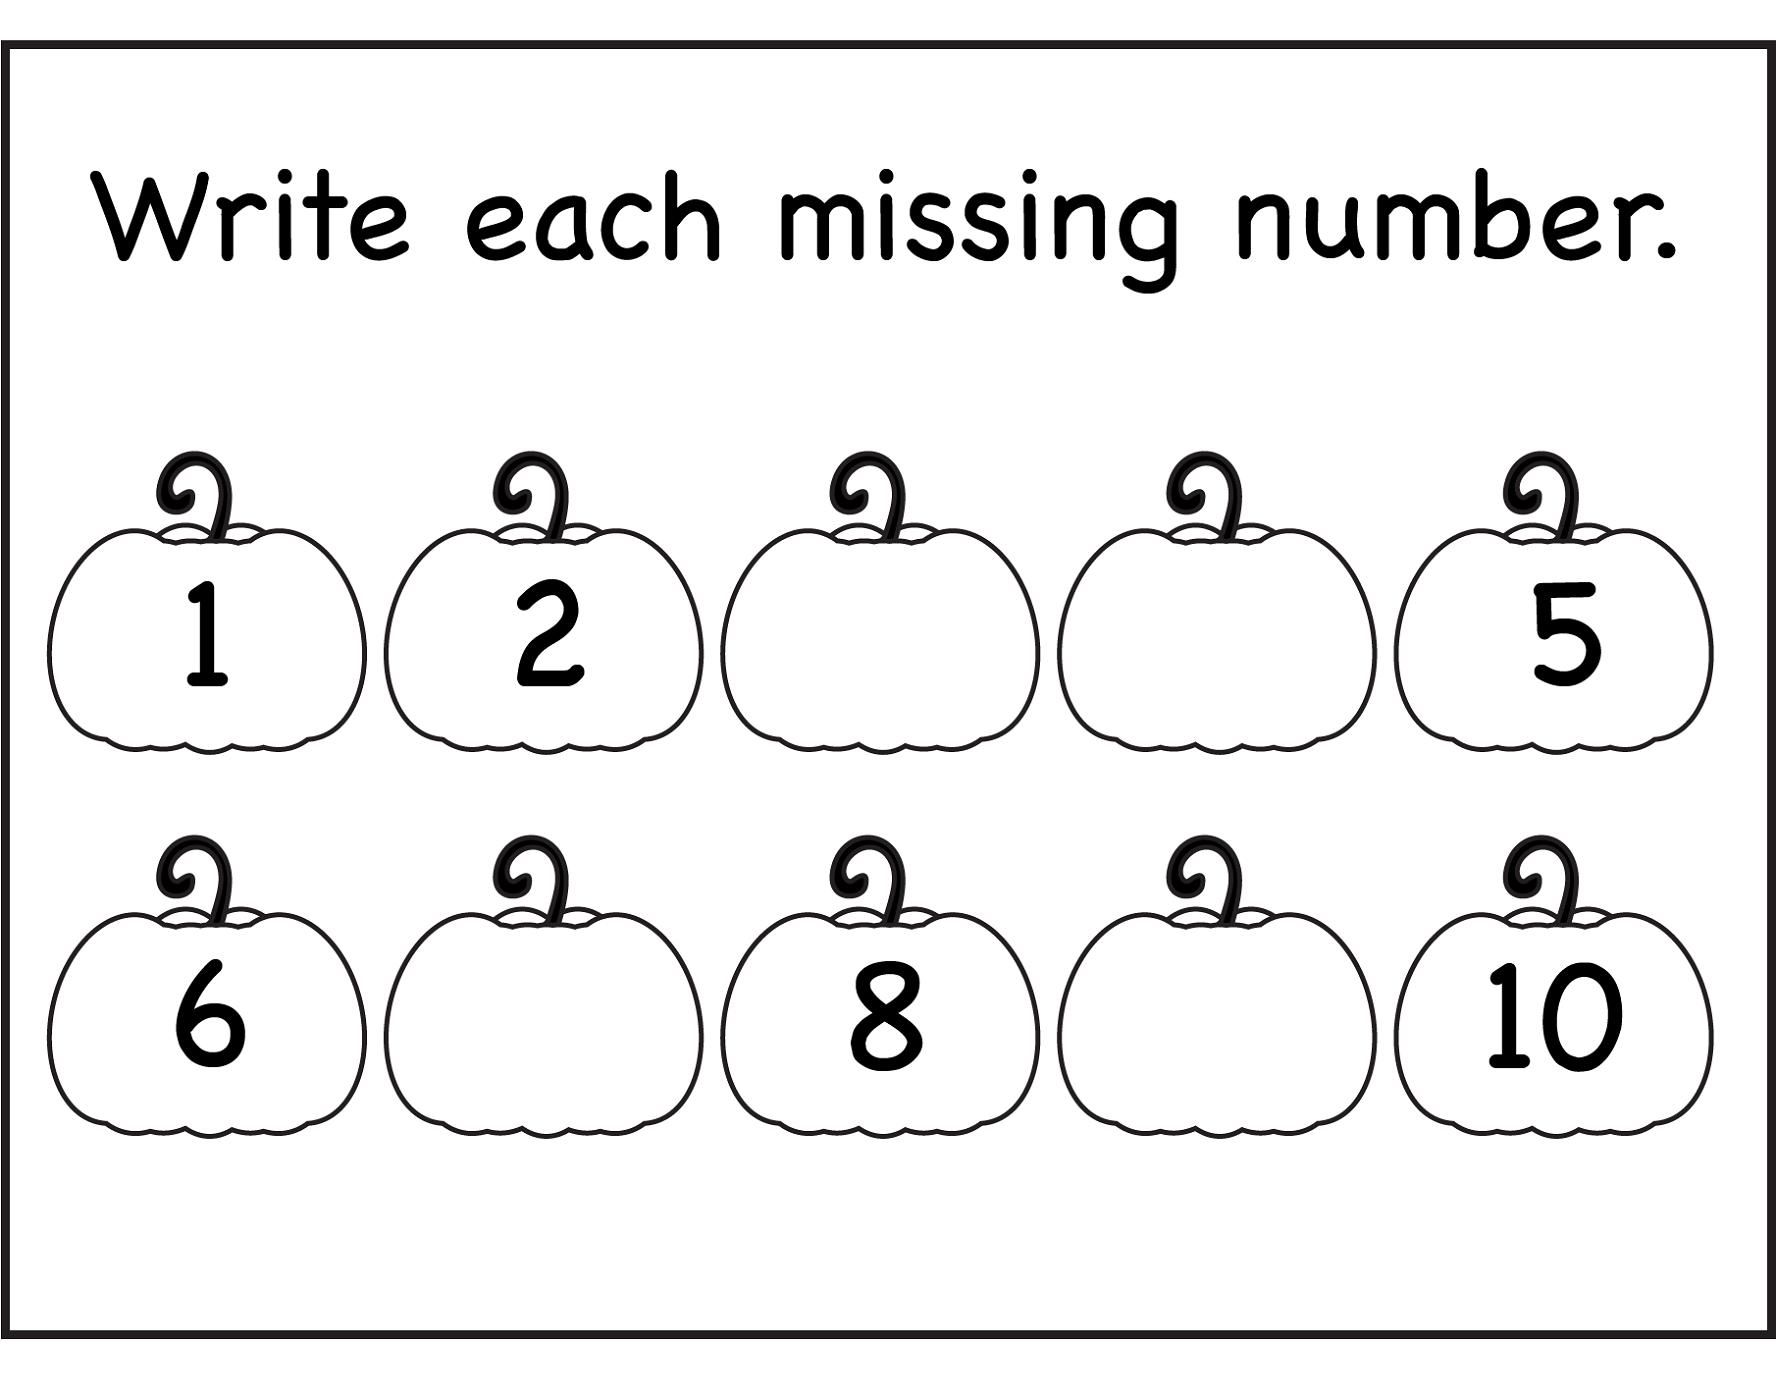 Number Worksheets For Kids The Best Worksheets Image Collection